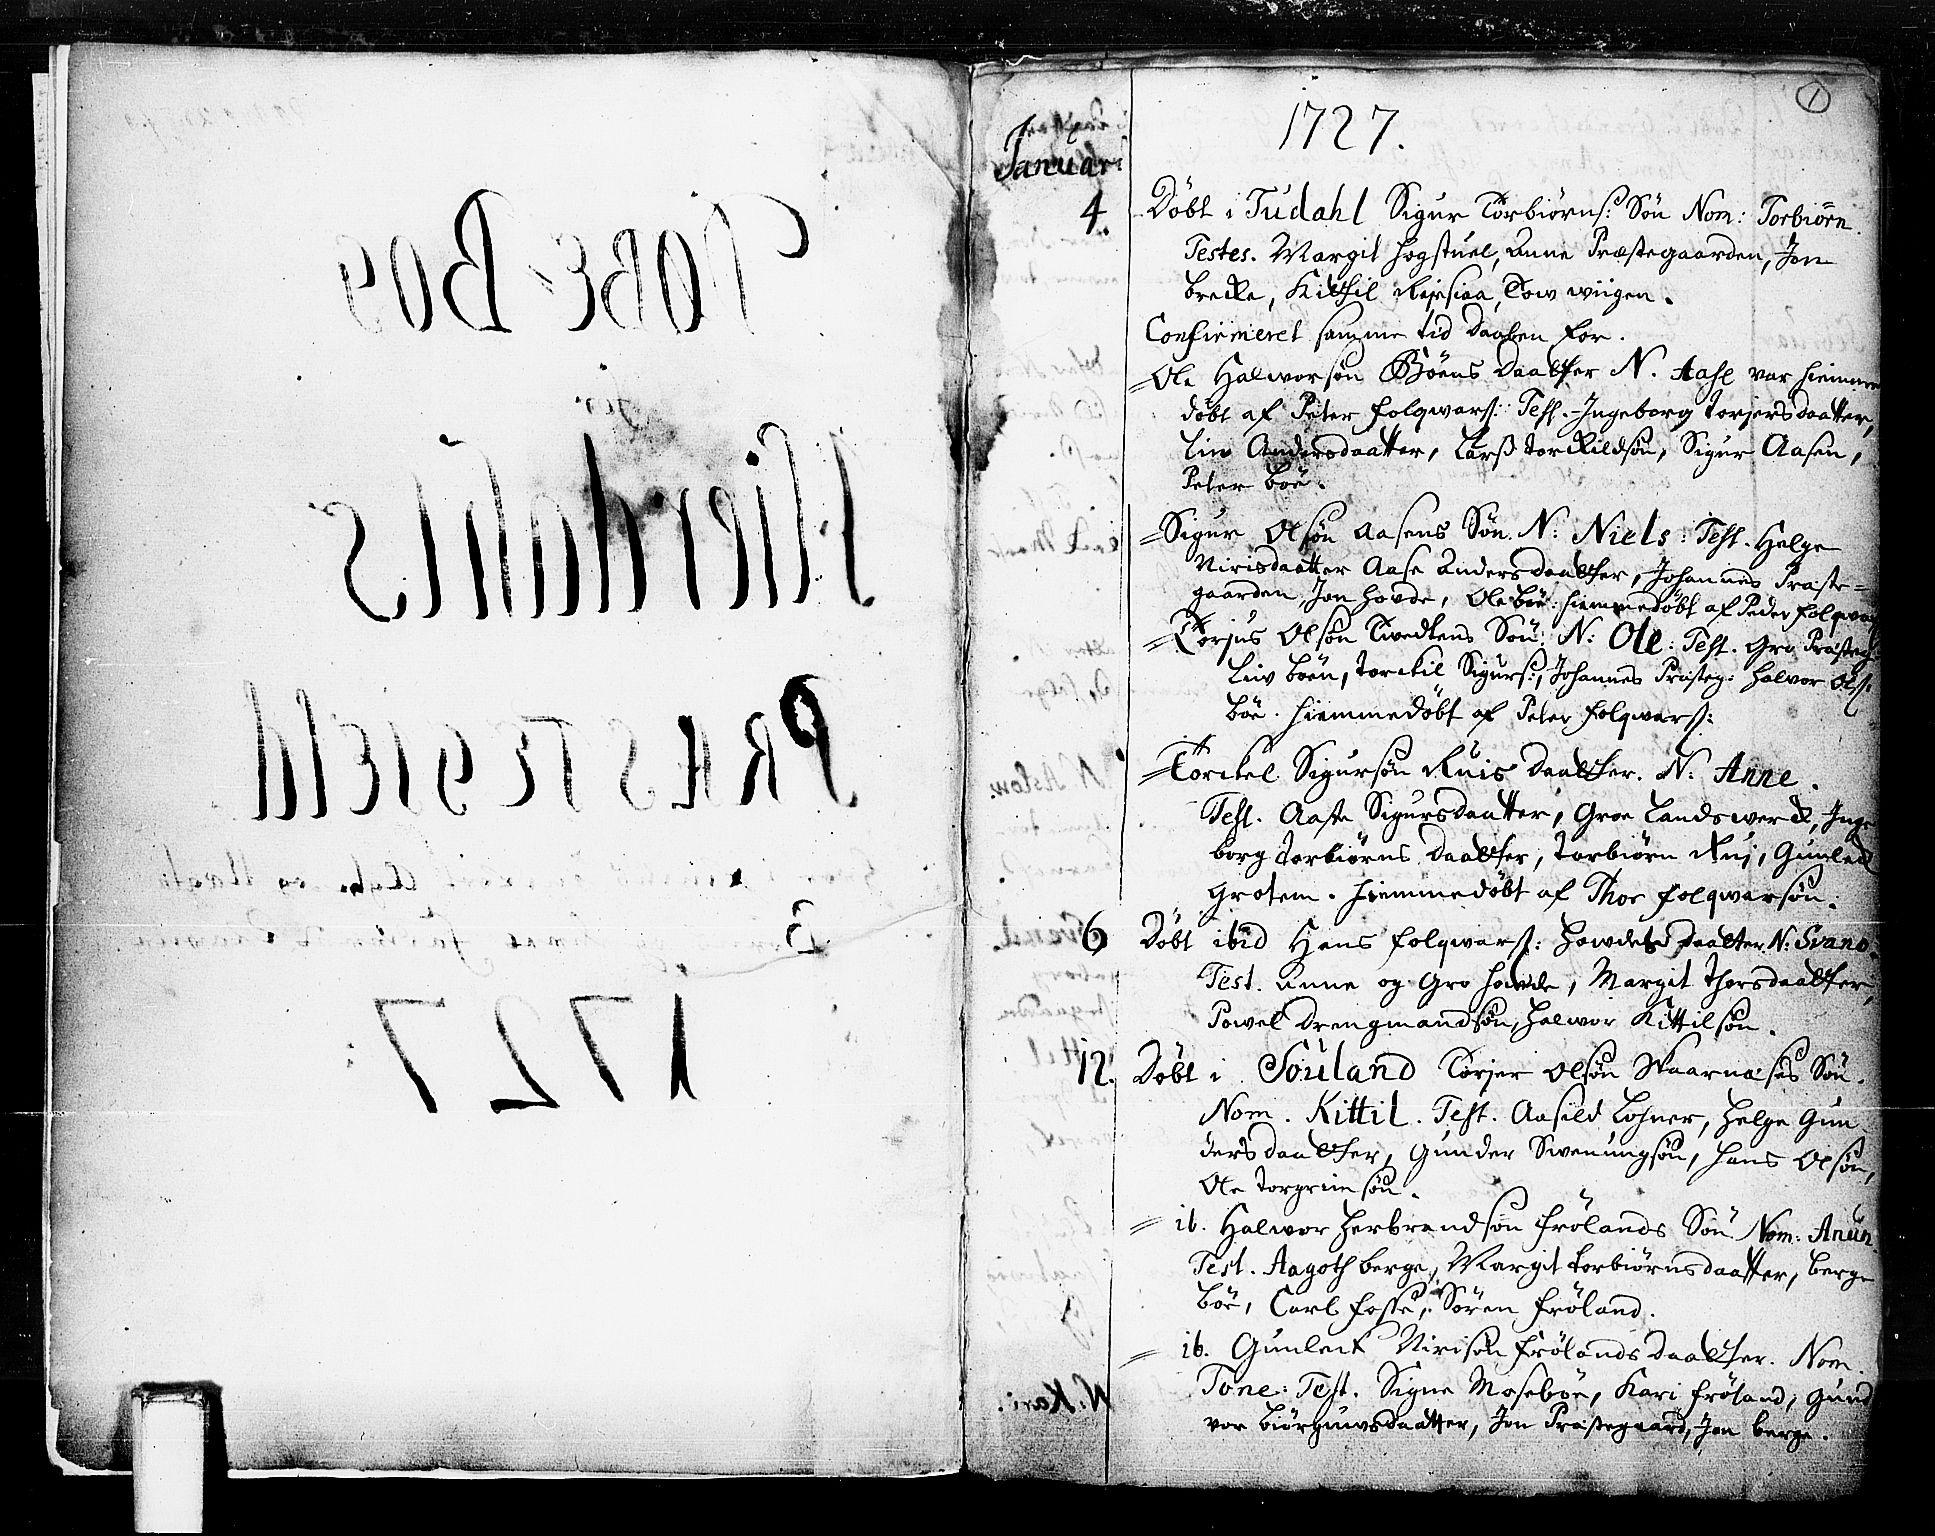 SAKO, Hjartdal kirkebøker, F/Fa/L0003: Ministerialbok nr. I 3, 1727-1775, s. 1